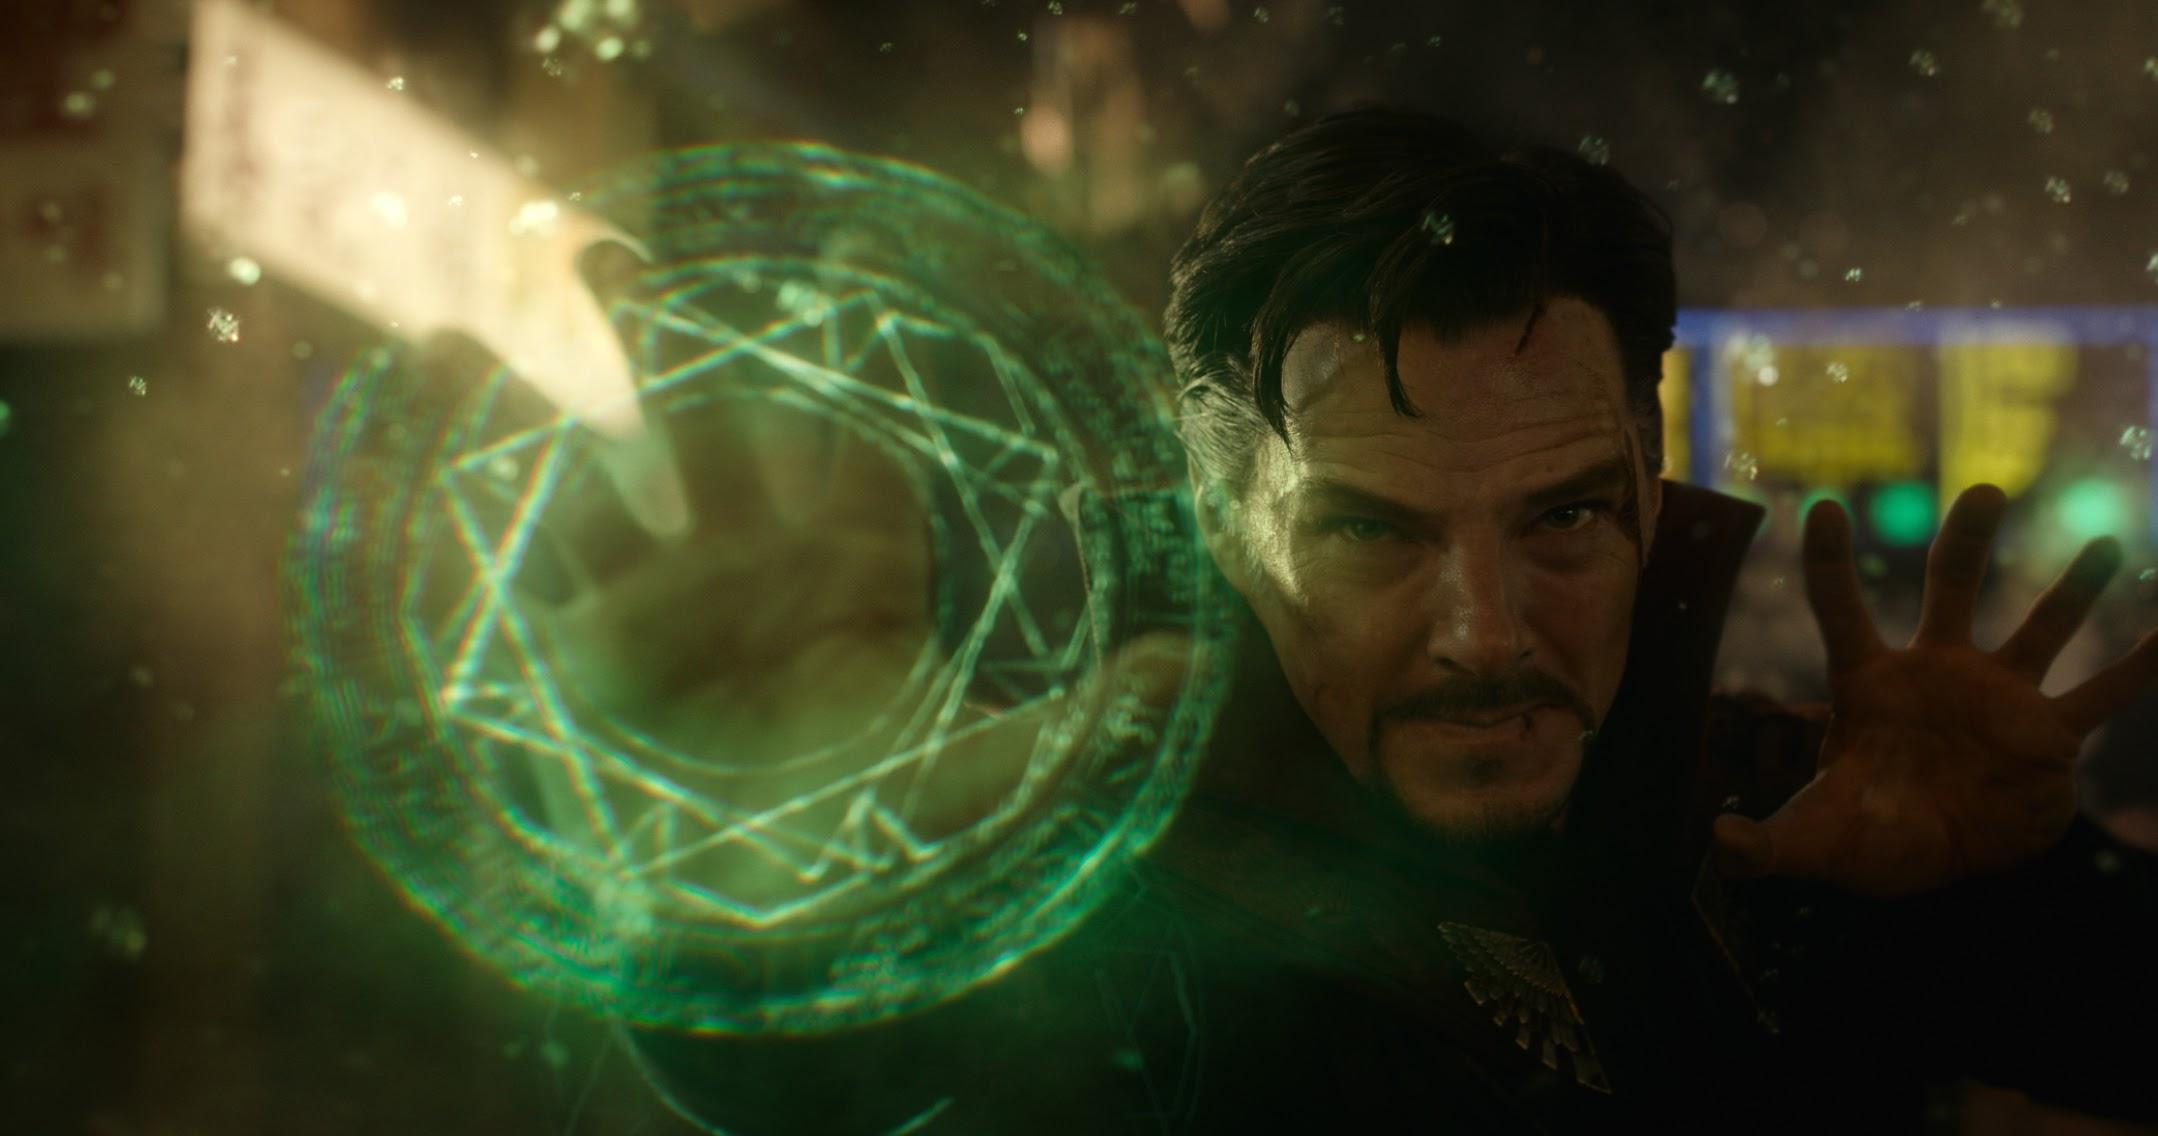 Doctor Strang 2 : ベネディクト・カンバーバッチの魔法使いのヒーローが帰ってくる続編「ドクター・ストレンジ 2」の製作が正式に決定 ! !